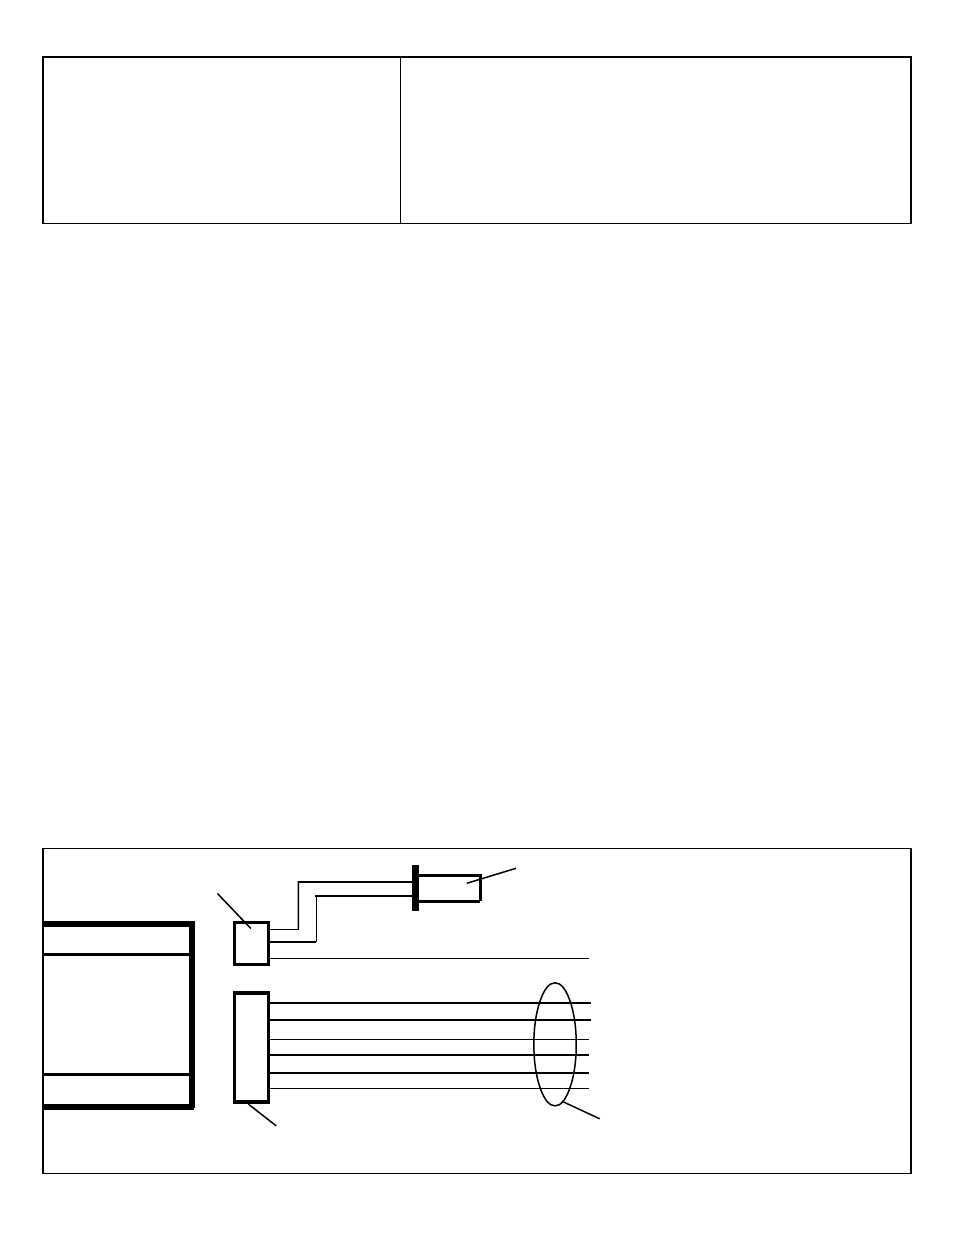 audiovox radio wiring diagram   29 wiring diagram images